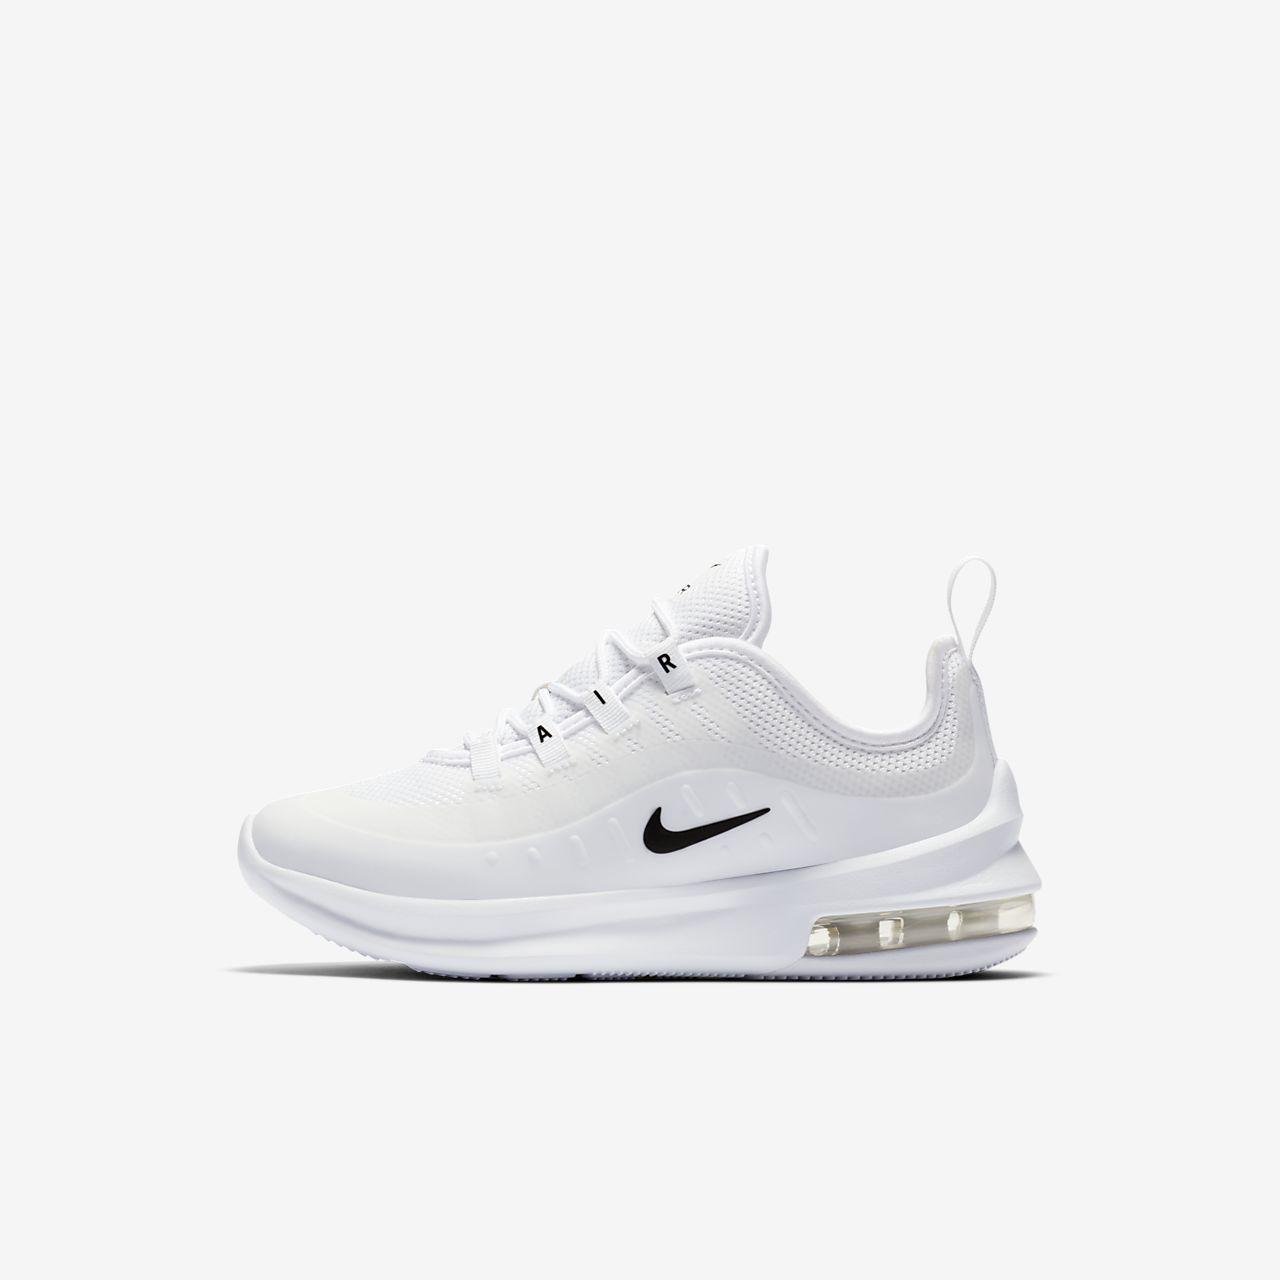 Nike Air Max Axis cipő gyerekeknek